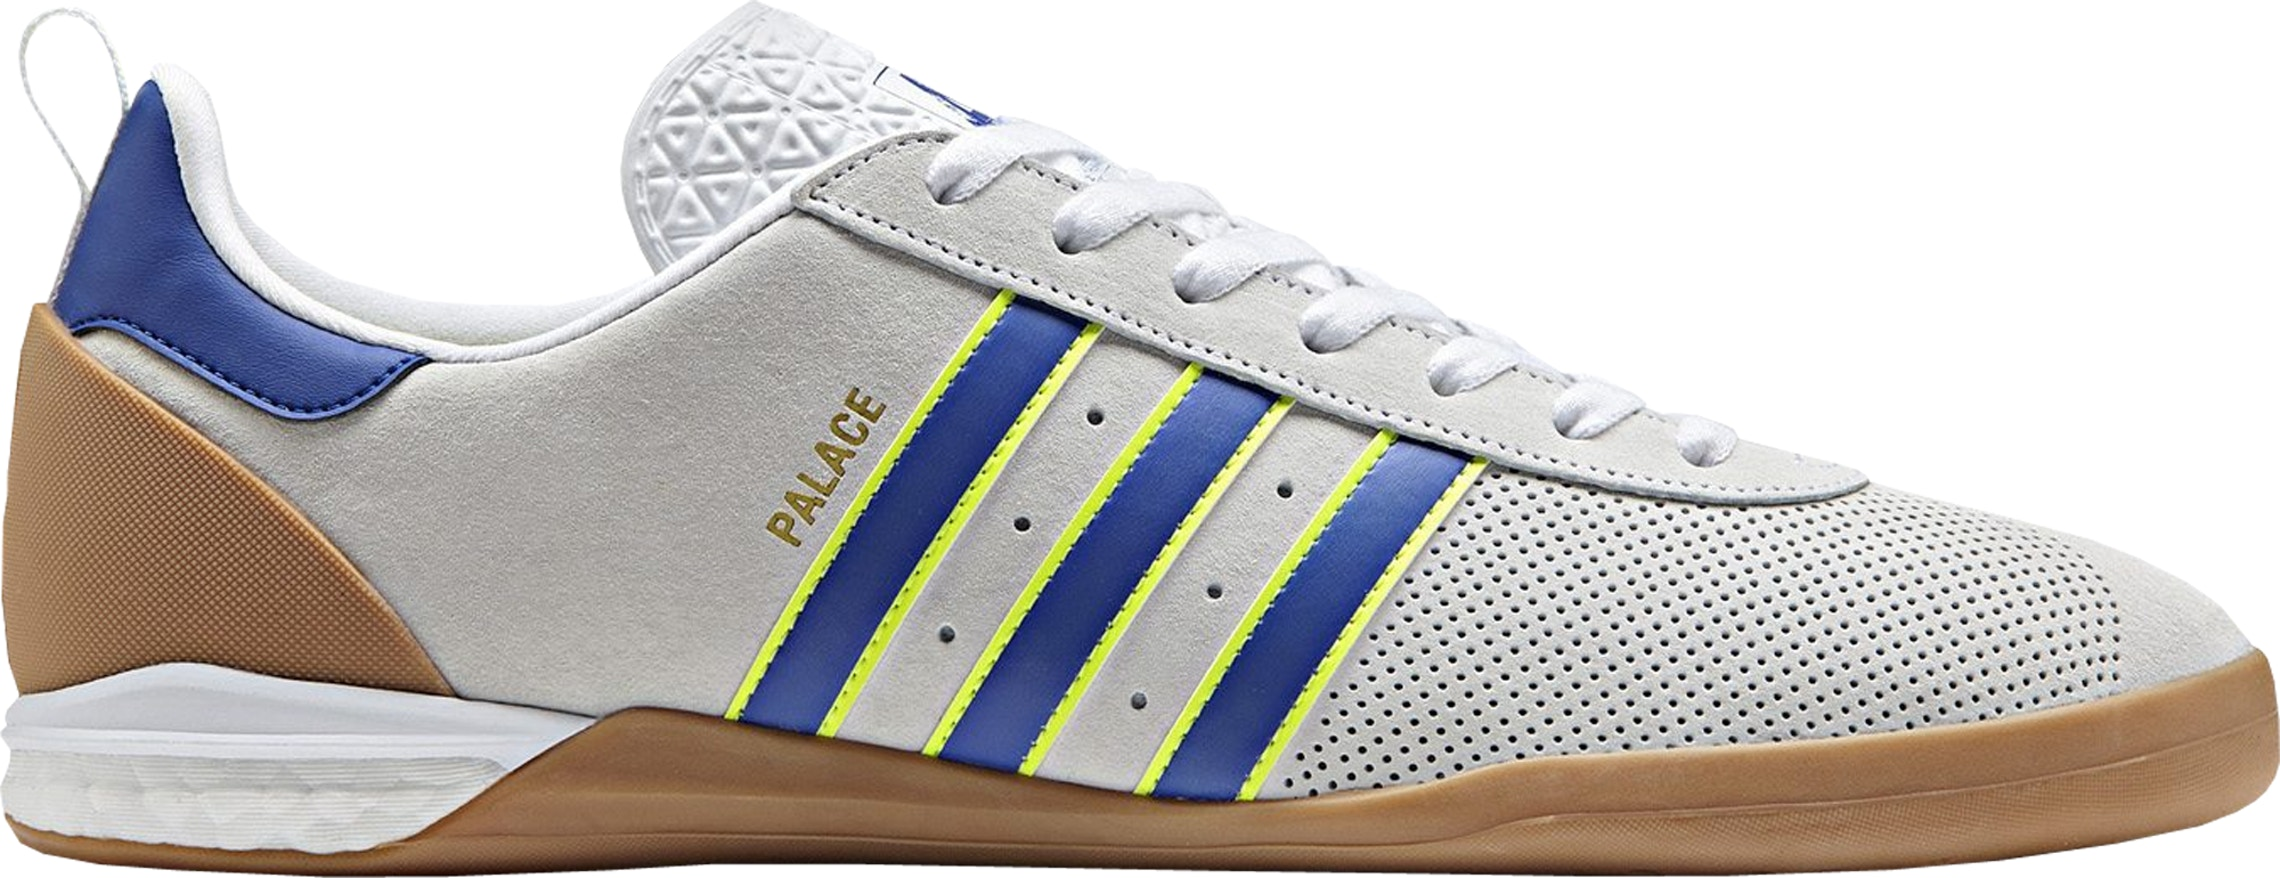 adidas Gazelle Indoor White